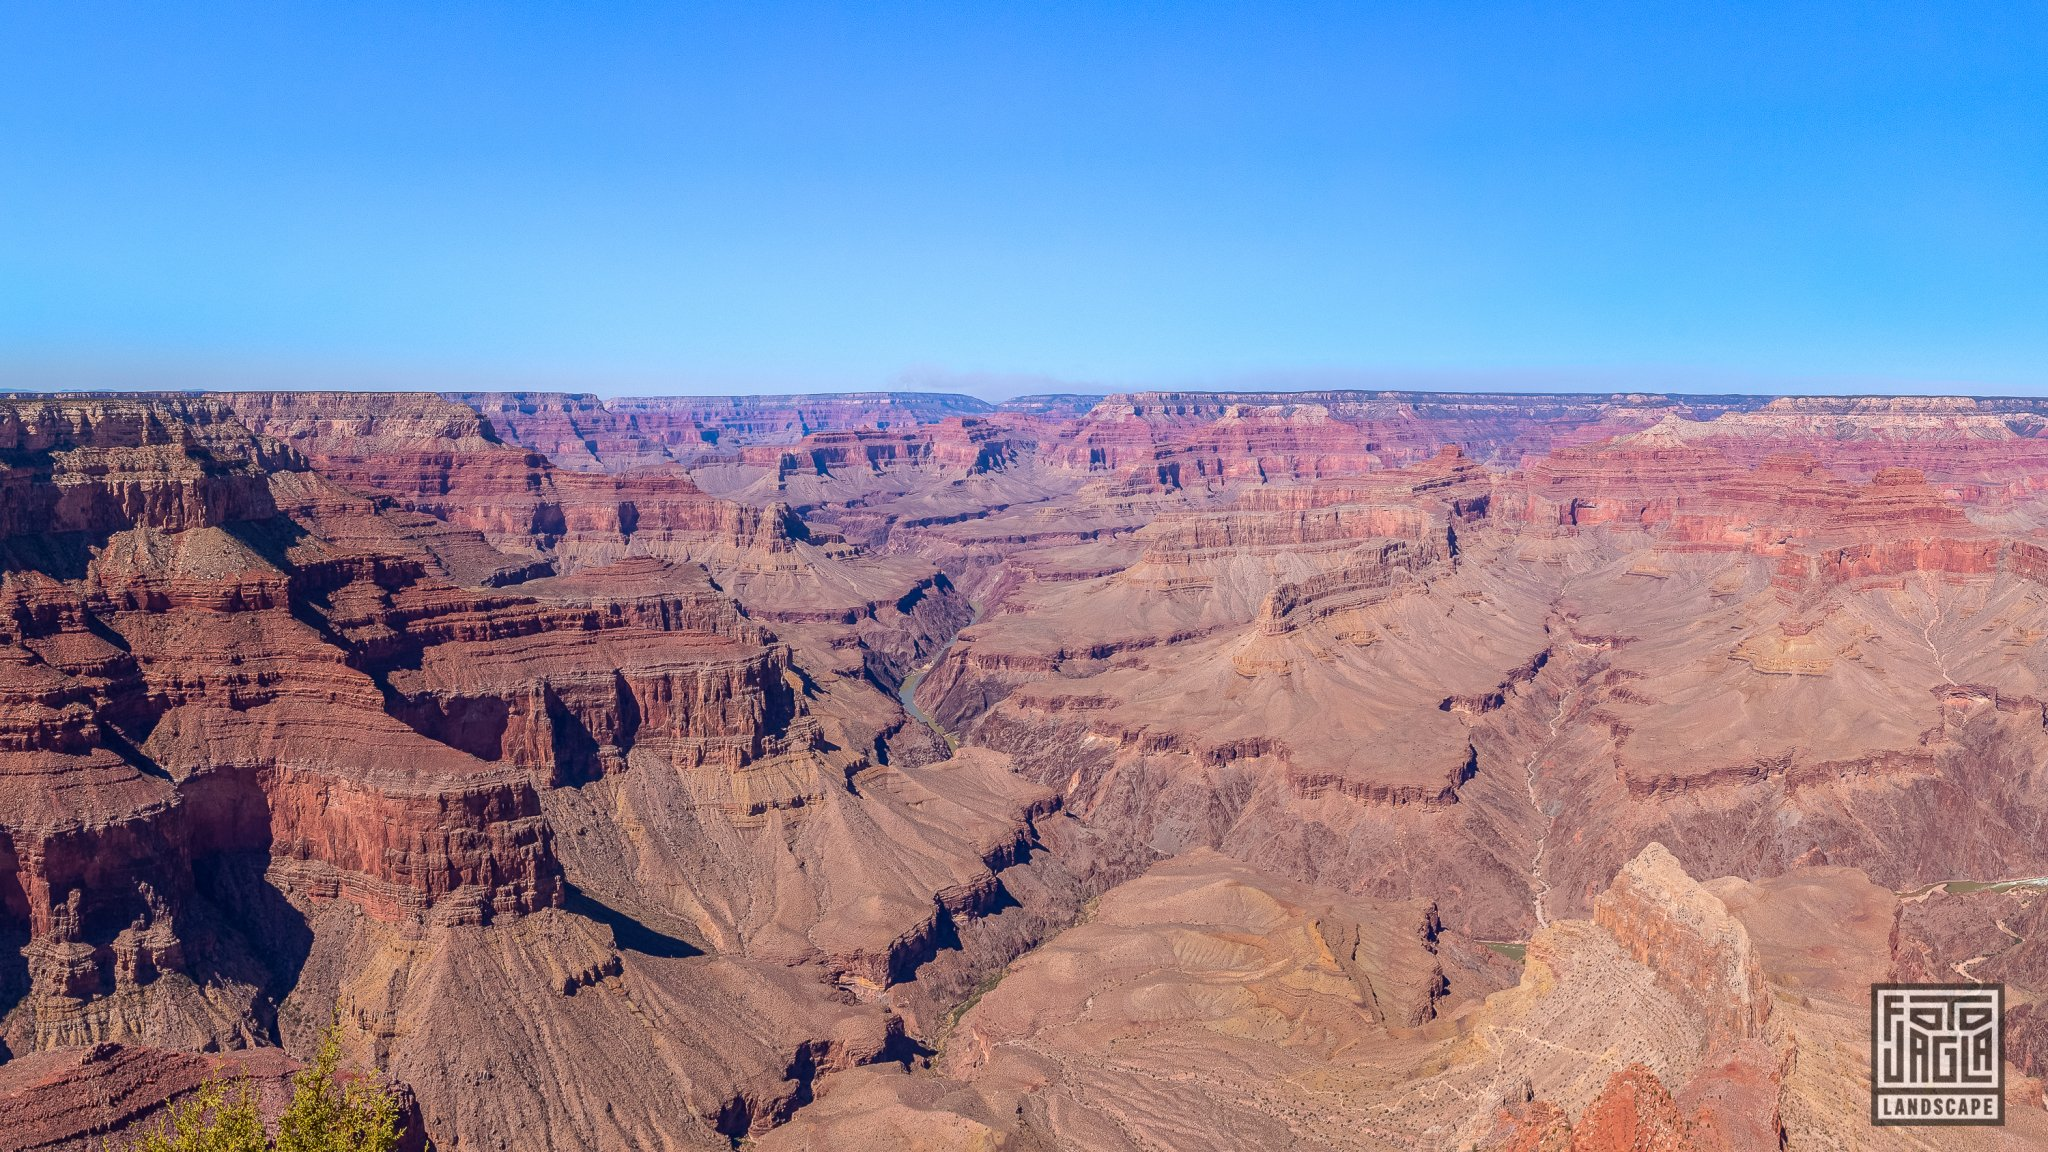 Pima Point in Grand Canyon Village Arizona, USA 2019